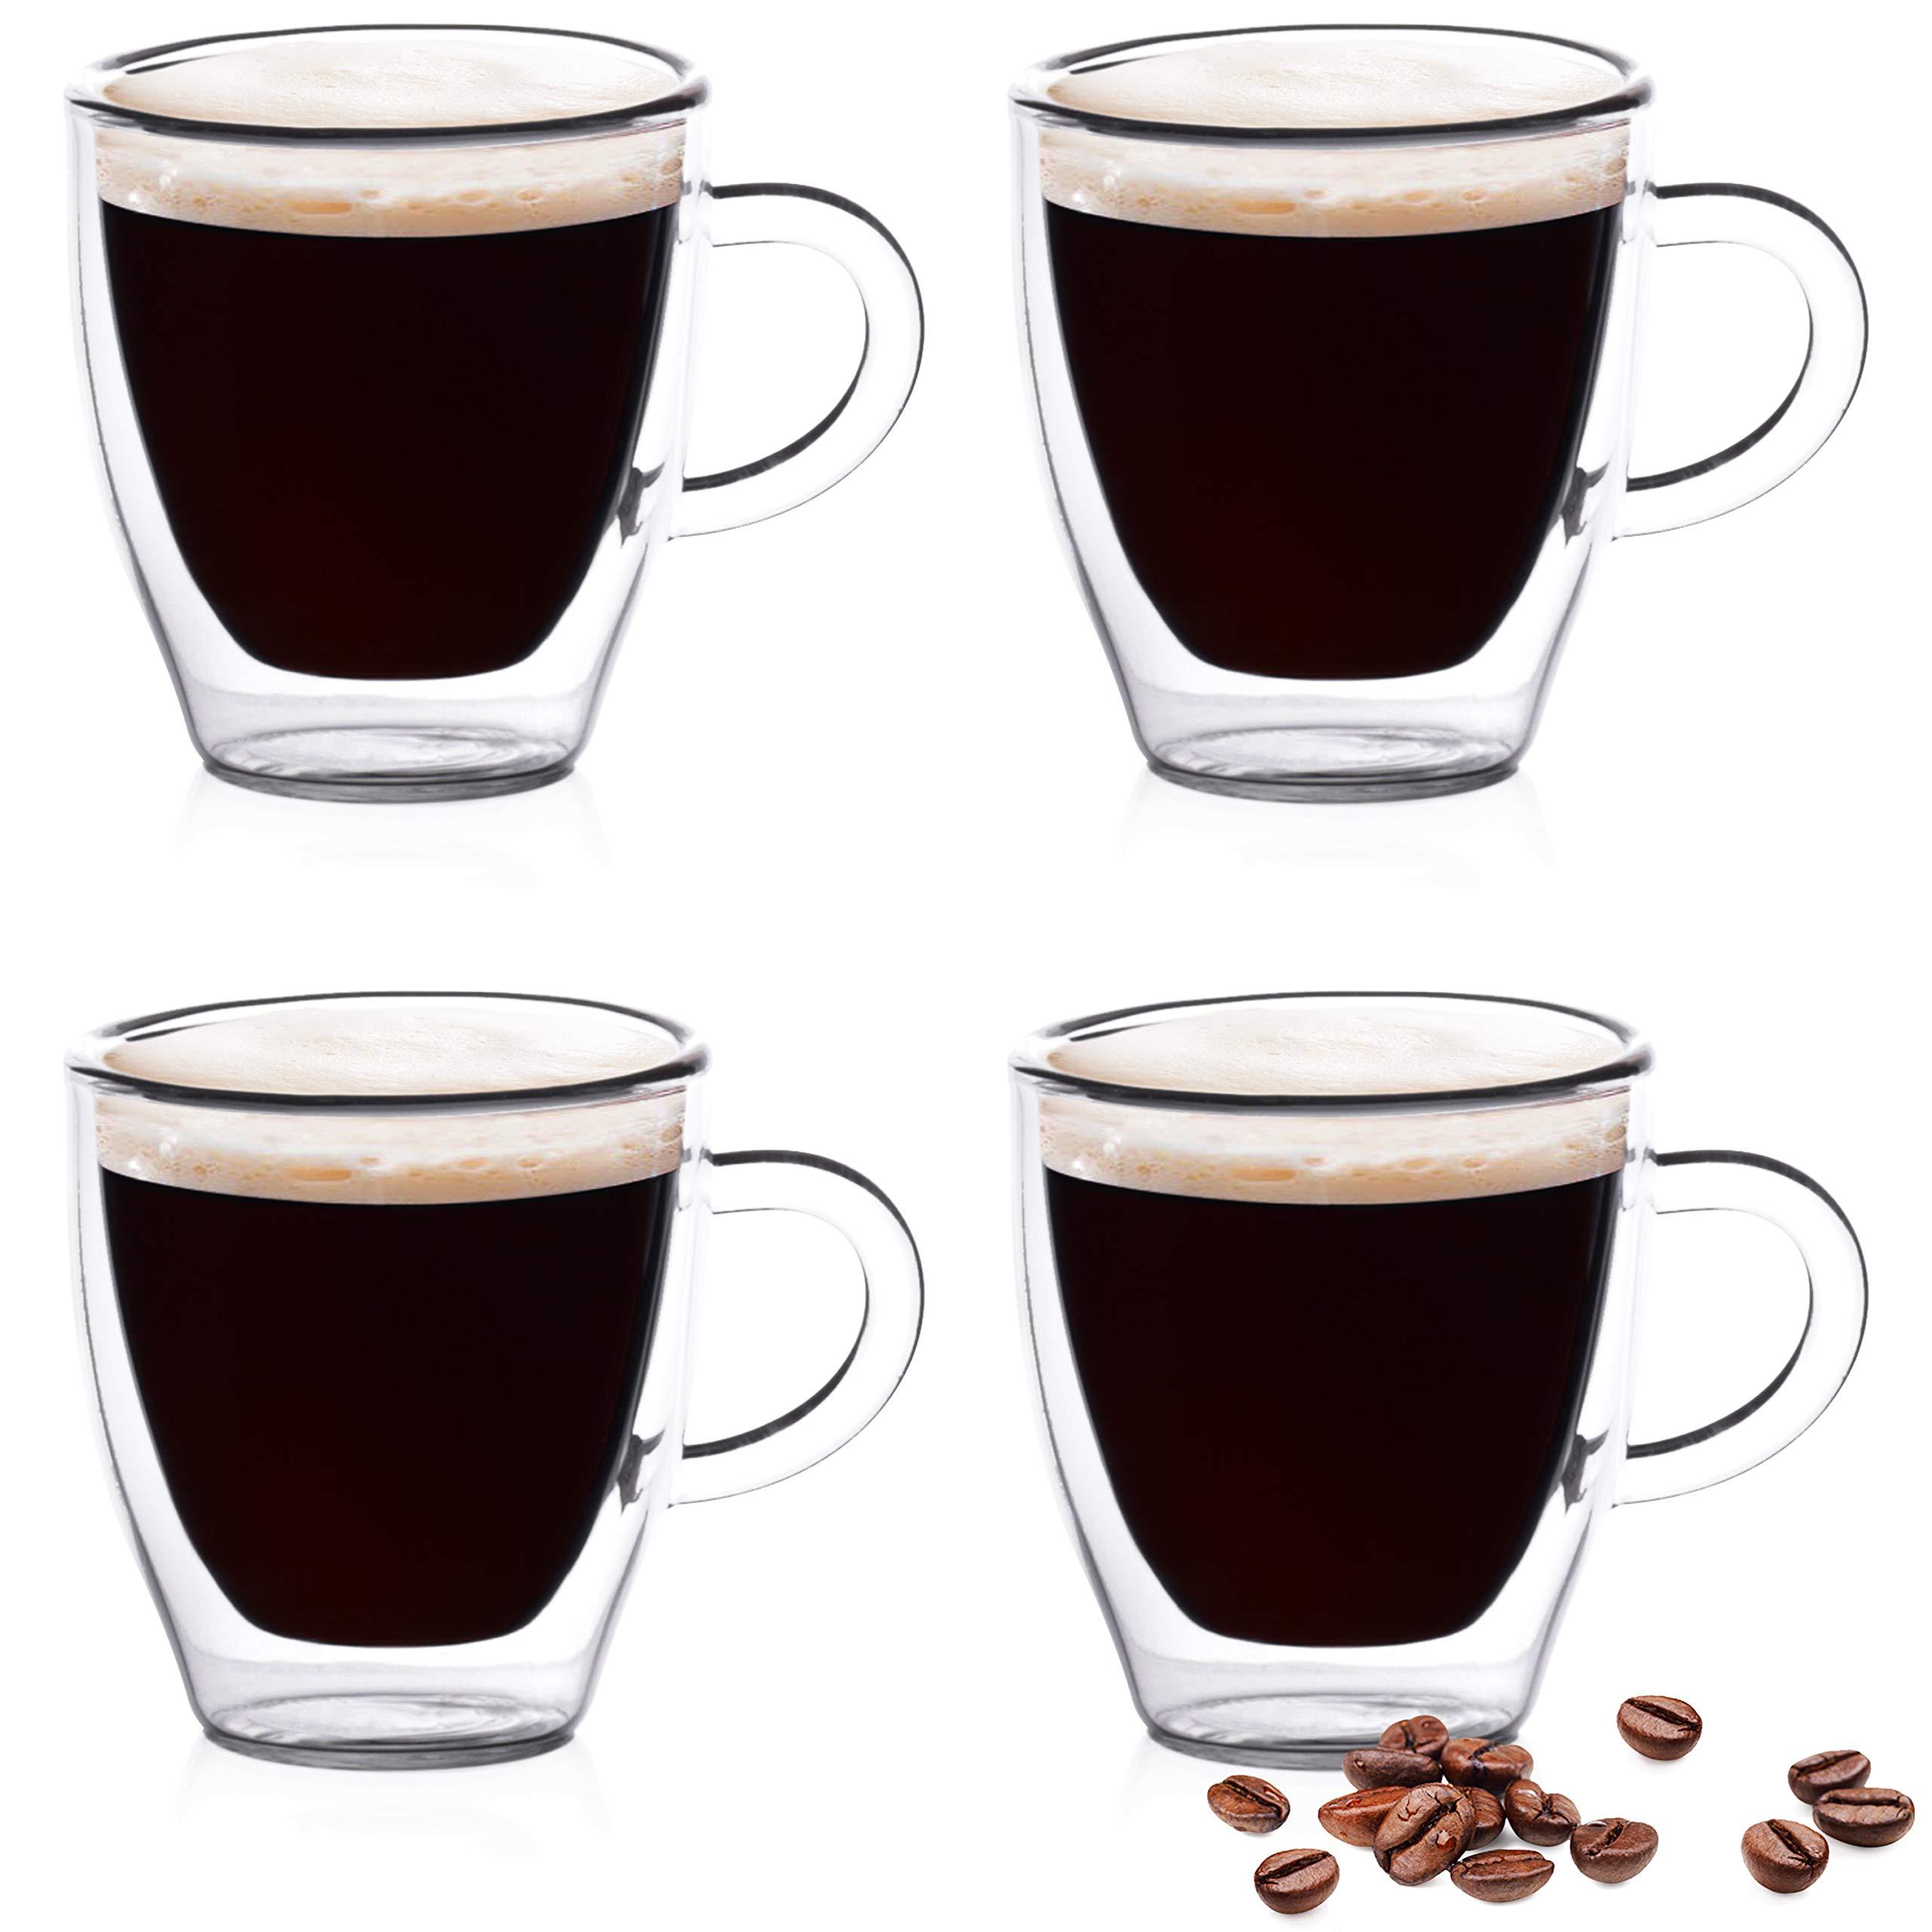 869adf55309 Eparé Espresso Cups, Insulated Glass Demitasse Set (2 oz, 60 ml) –